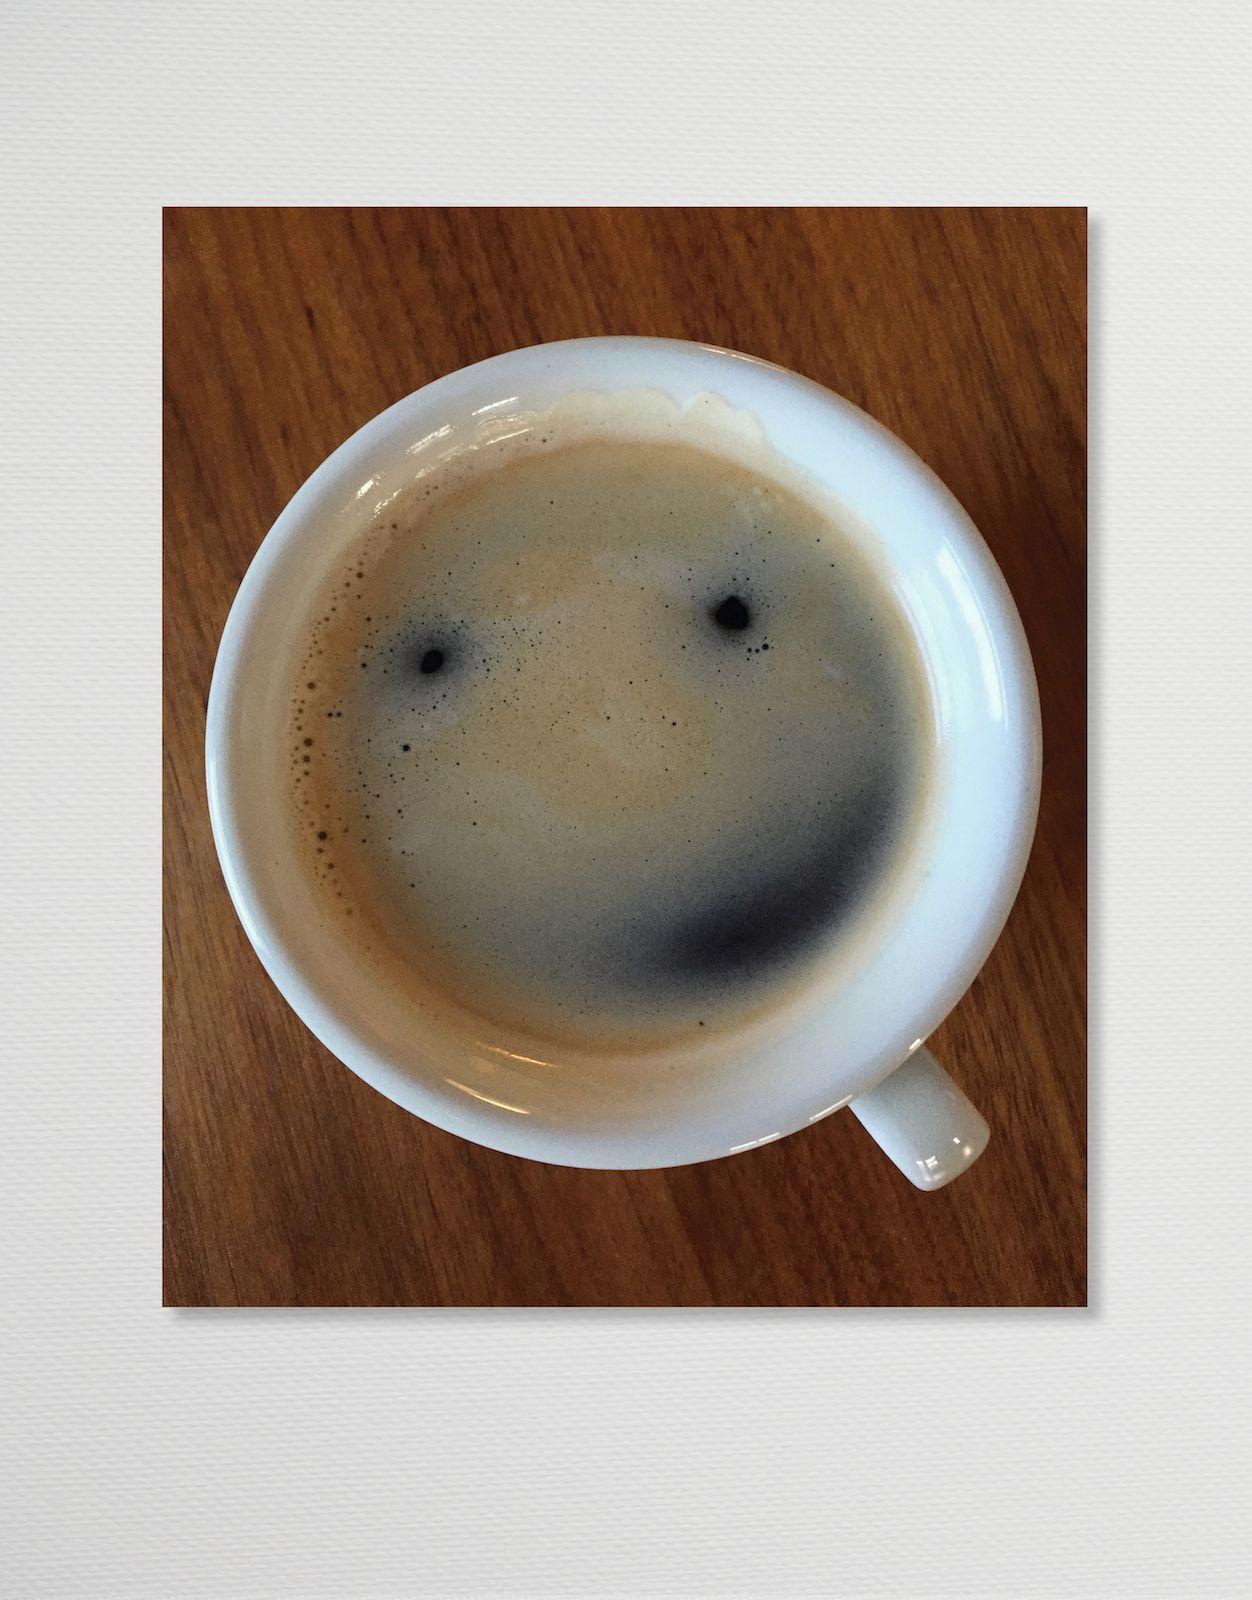 Good morning!, 2016, photo on di-bond, 100 x 84 cm, edition 3 + 1 AP